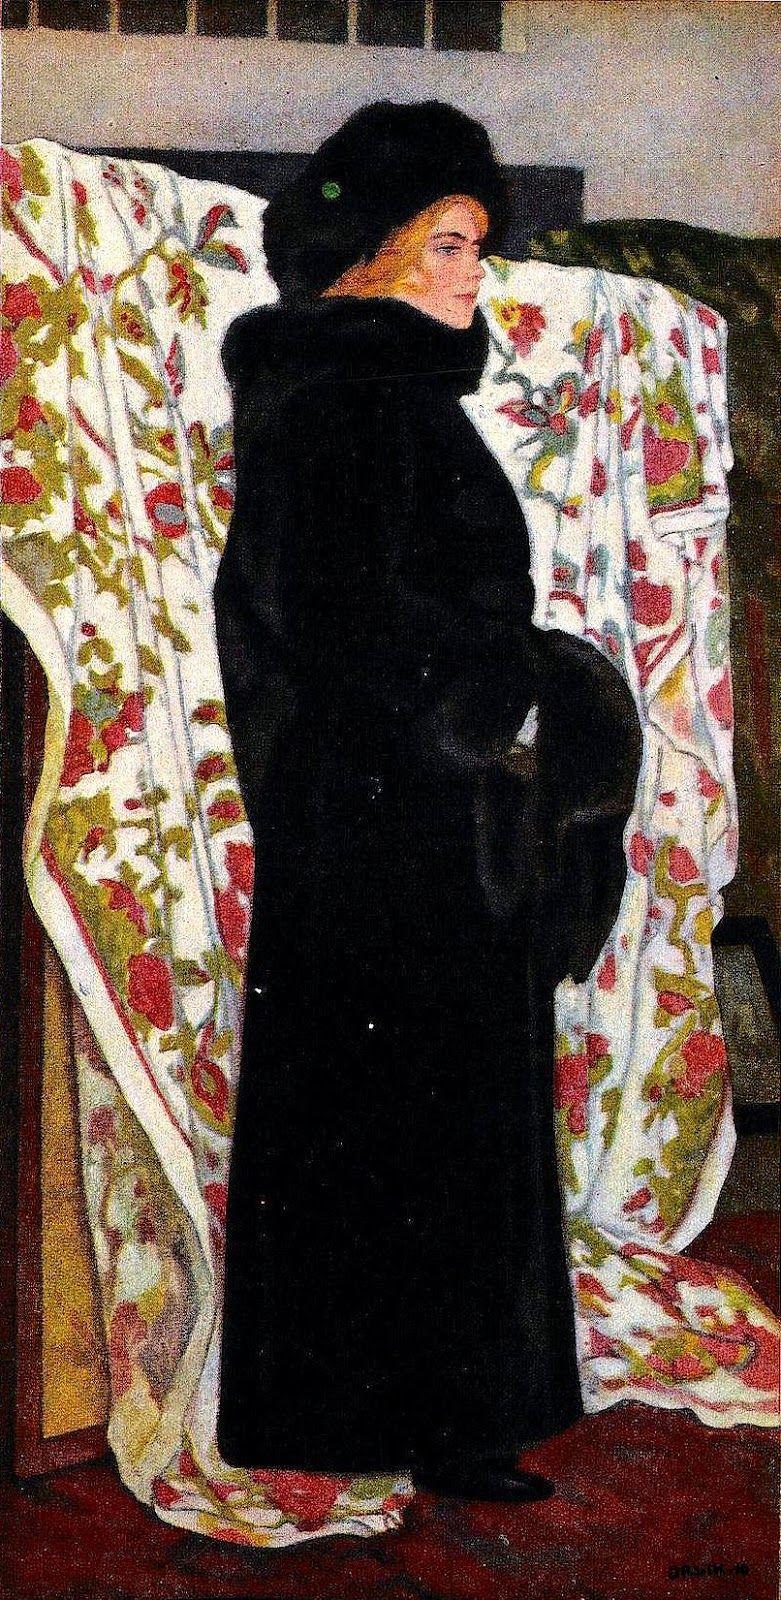 Emil Orlik (1870-1932, Austrian-Bohemian painter)